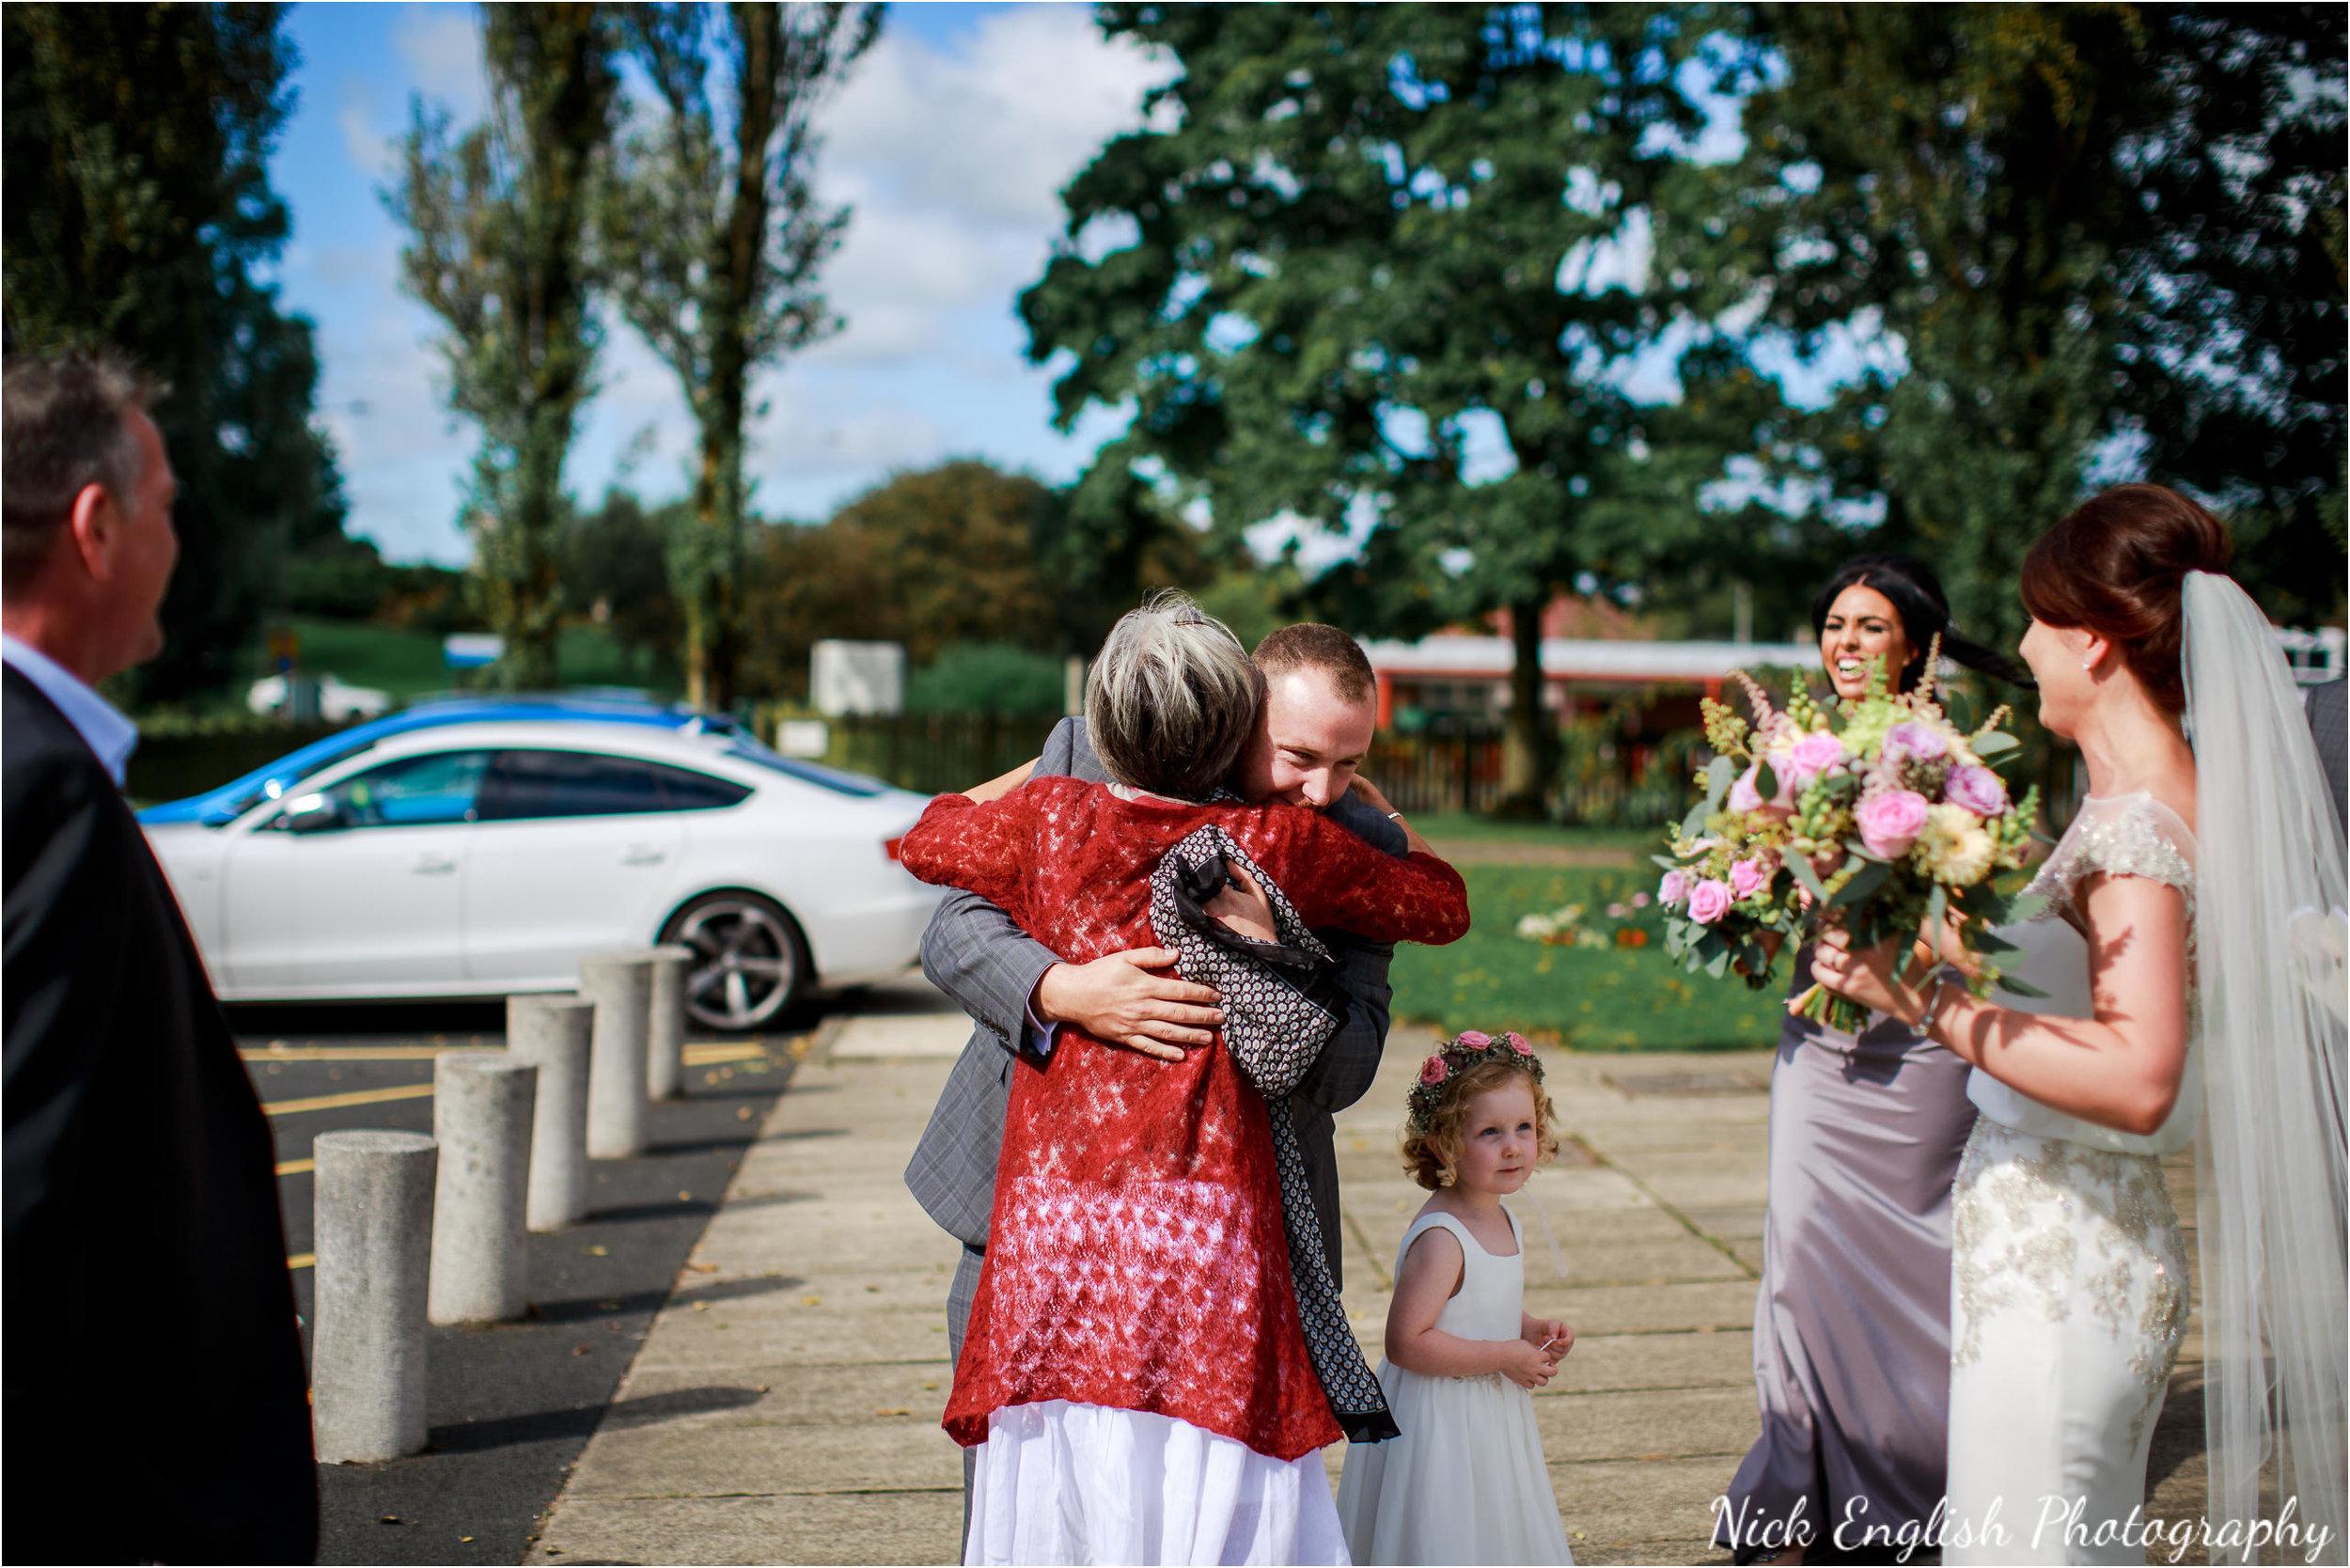 Stacey-Ash-Wedding-Photographs-Stanley-House-Preston-Lancashire-87.jpg